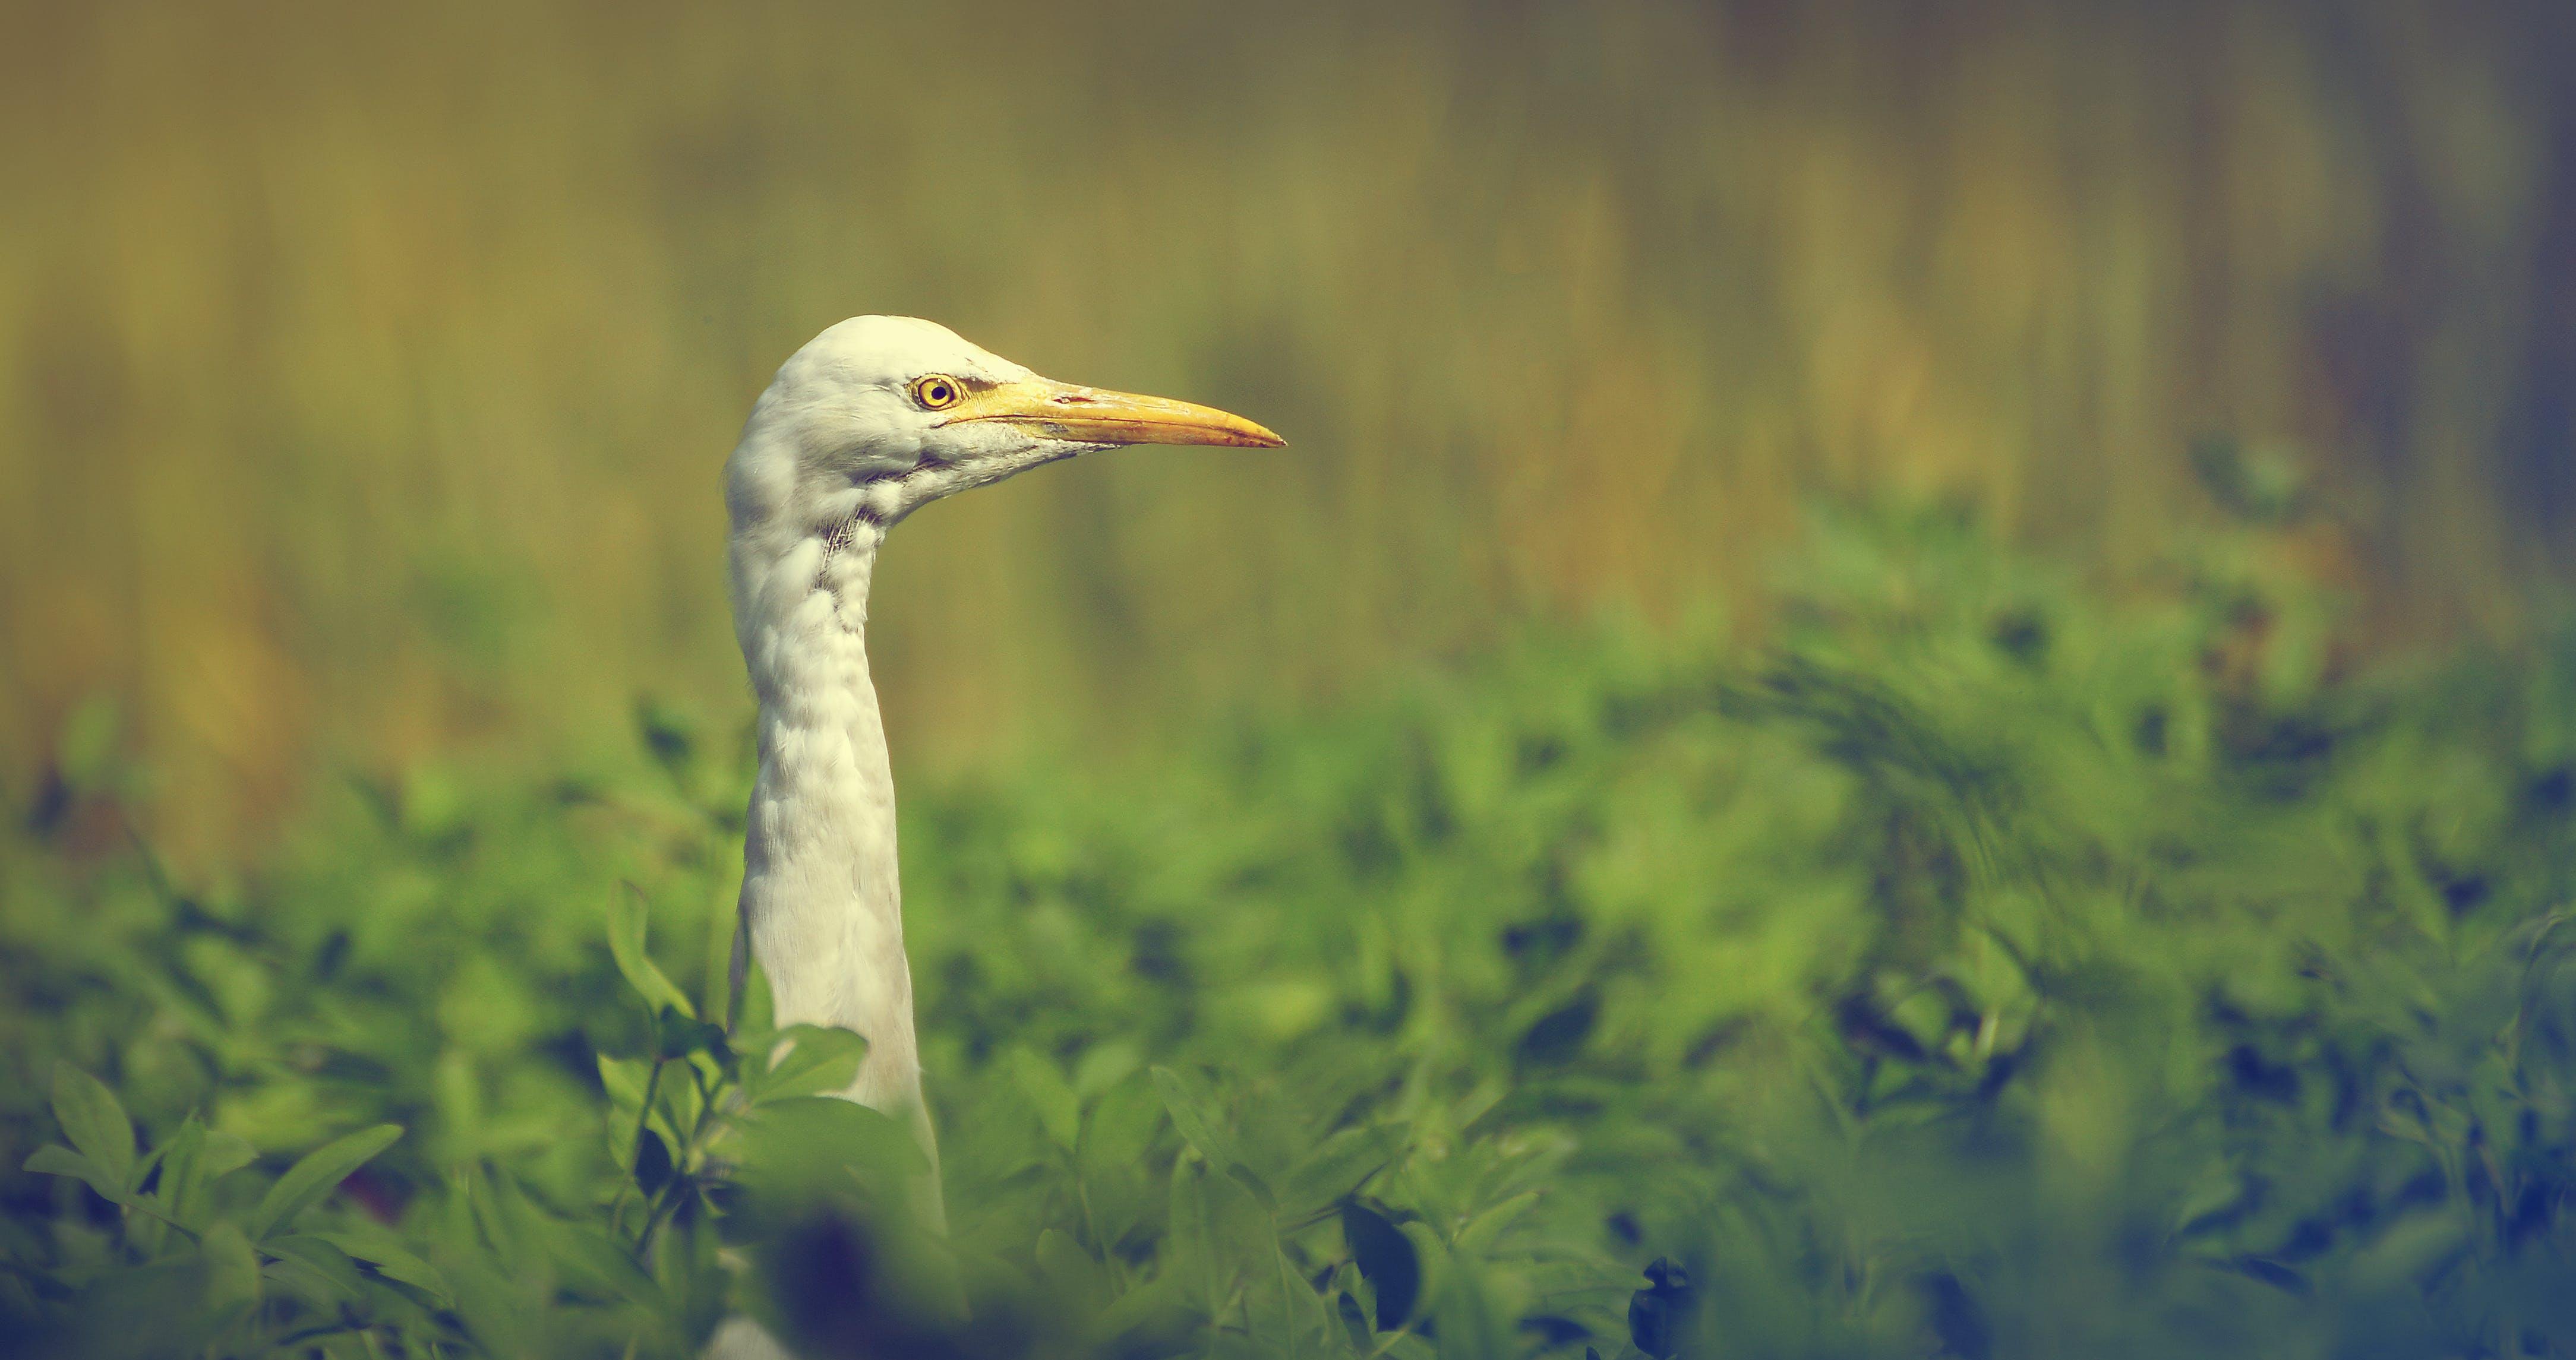 Free stock photo of #nature#birds#animal